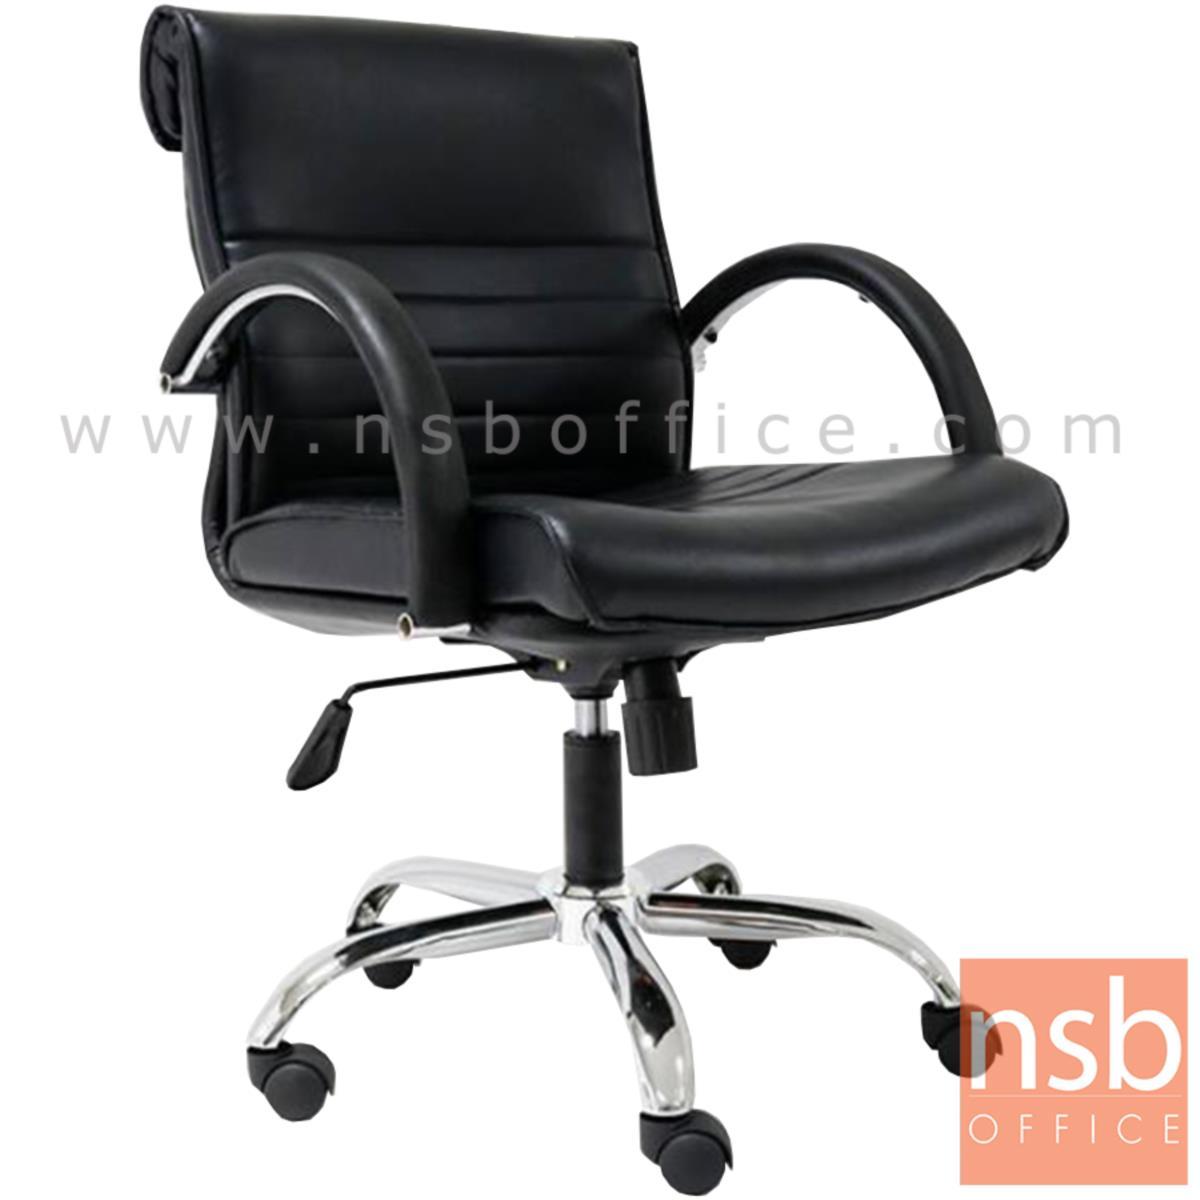 B01A233:เก้าอี้สำนักงาน รุ่น Conrad (คอนราด)  โช๊คแก๊ส มีก้อนโยก ขาเหล็กชุบโครเมี่ยม